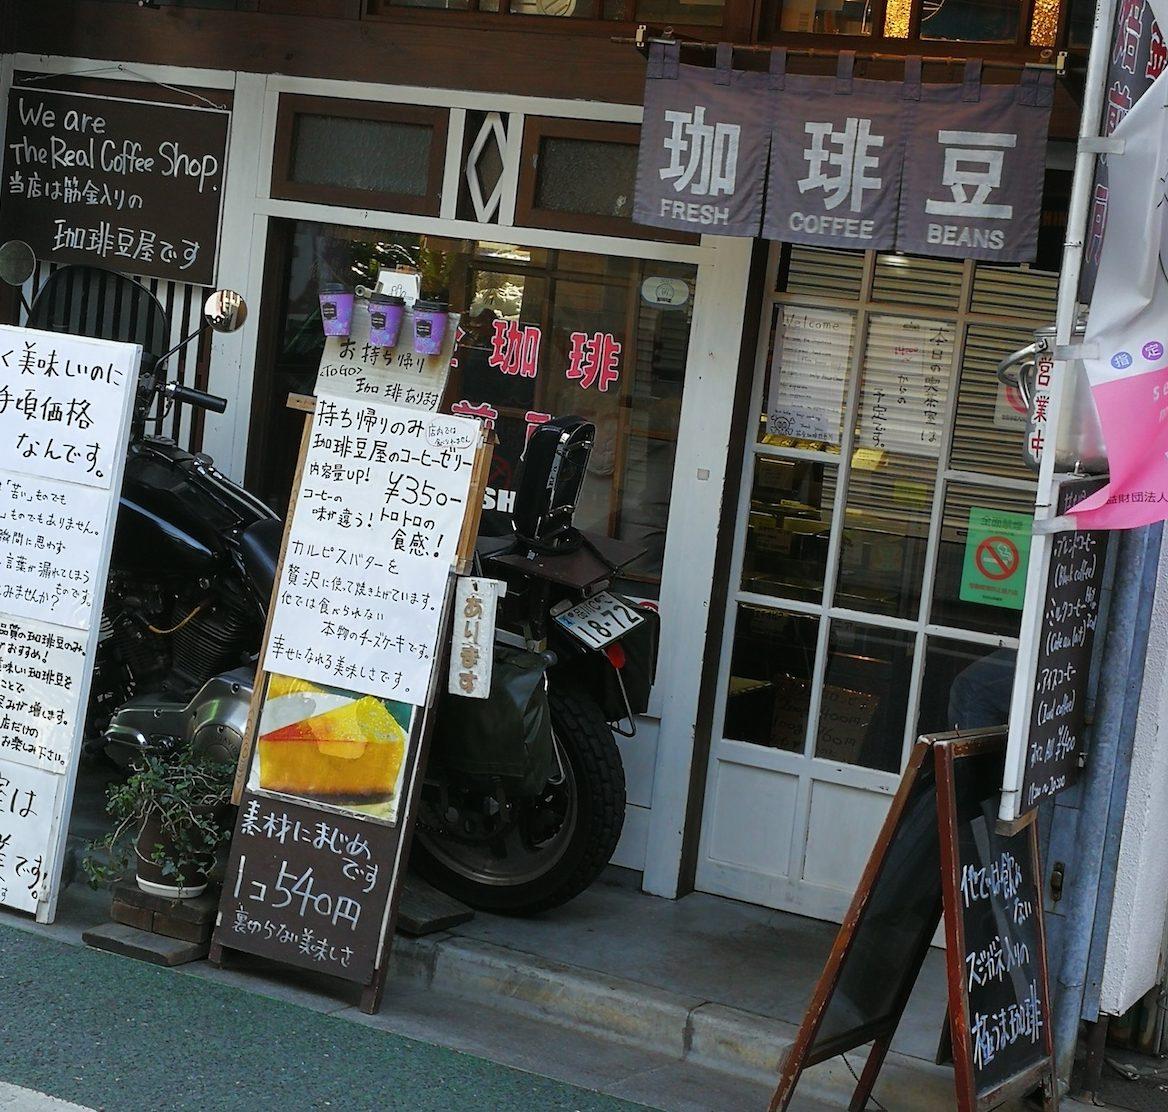 筋金珈琲焙煎所の外観写真